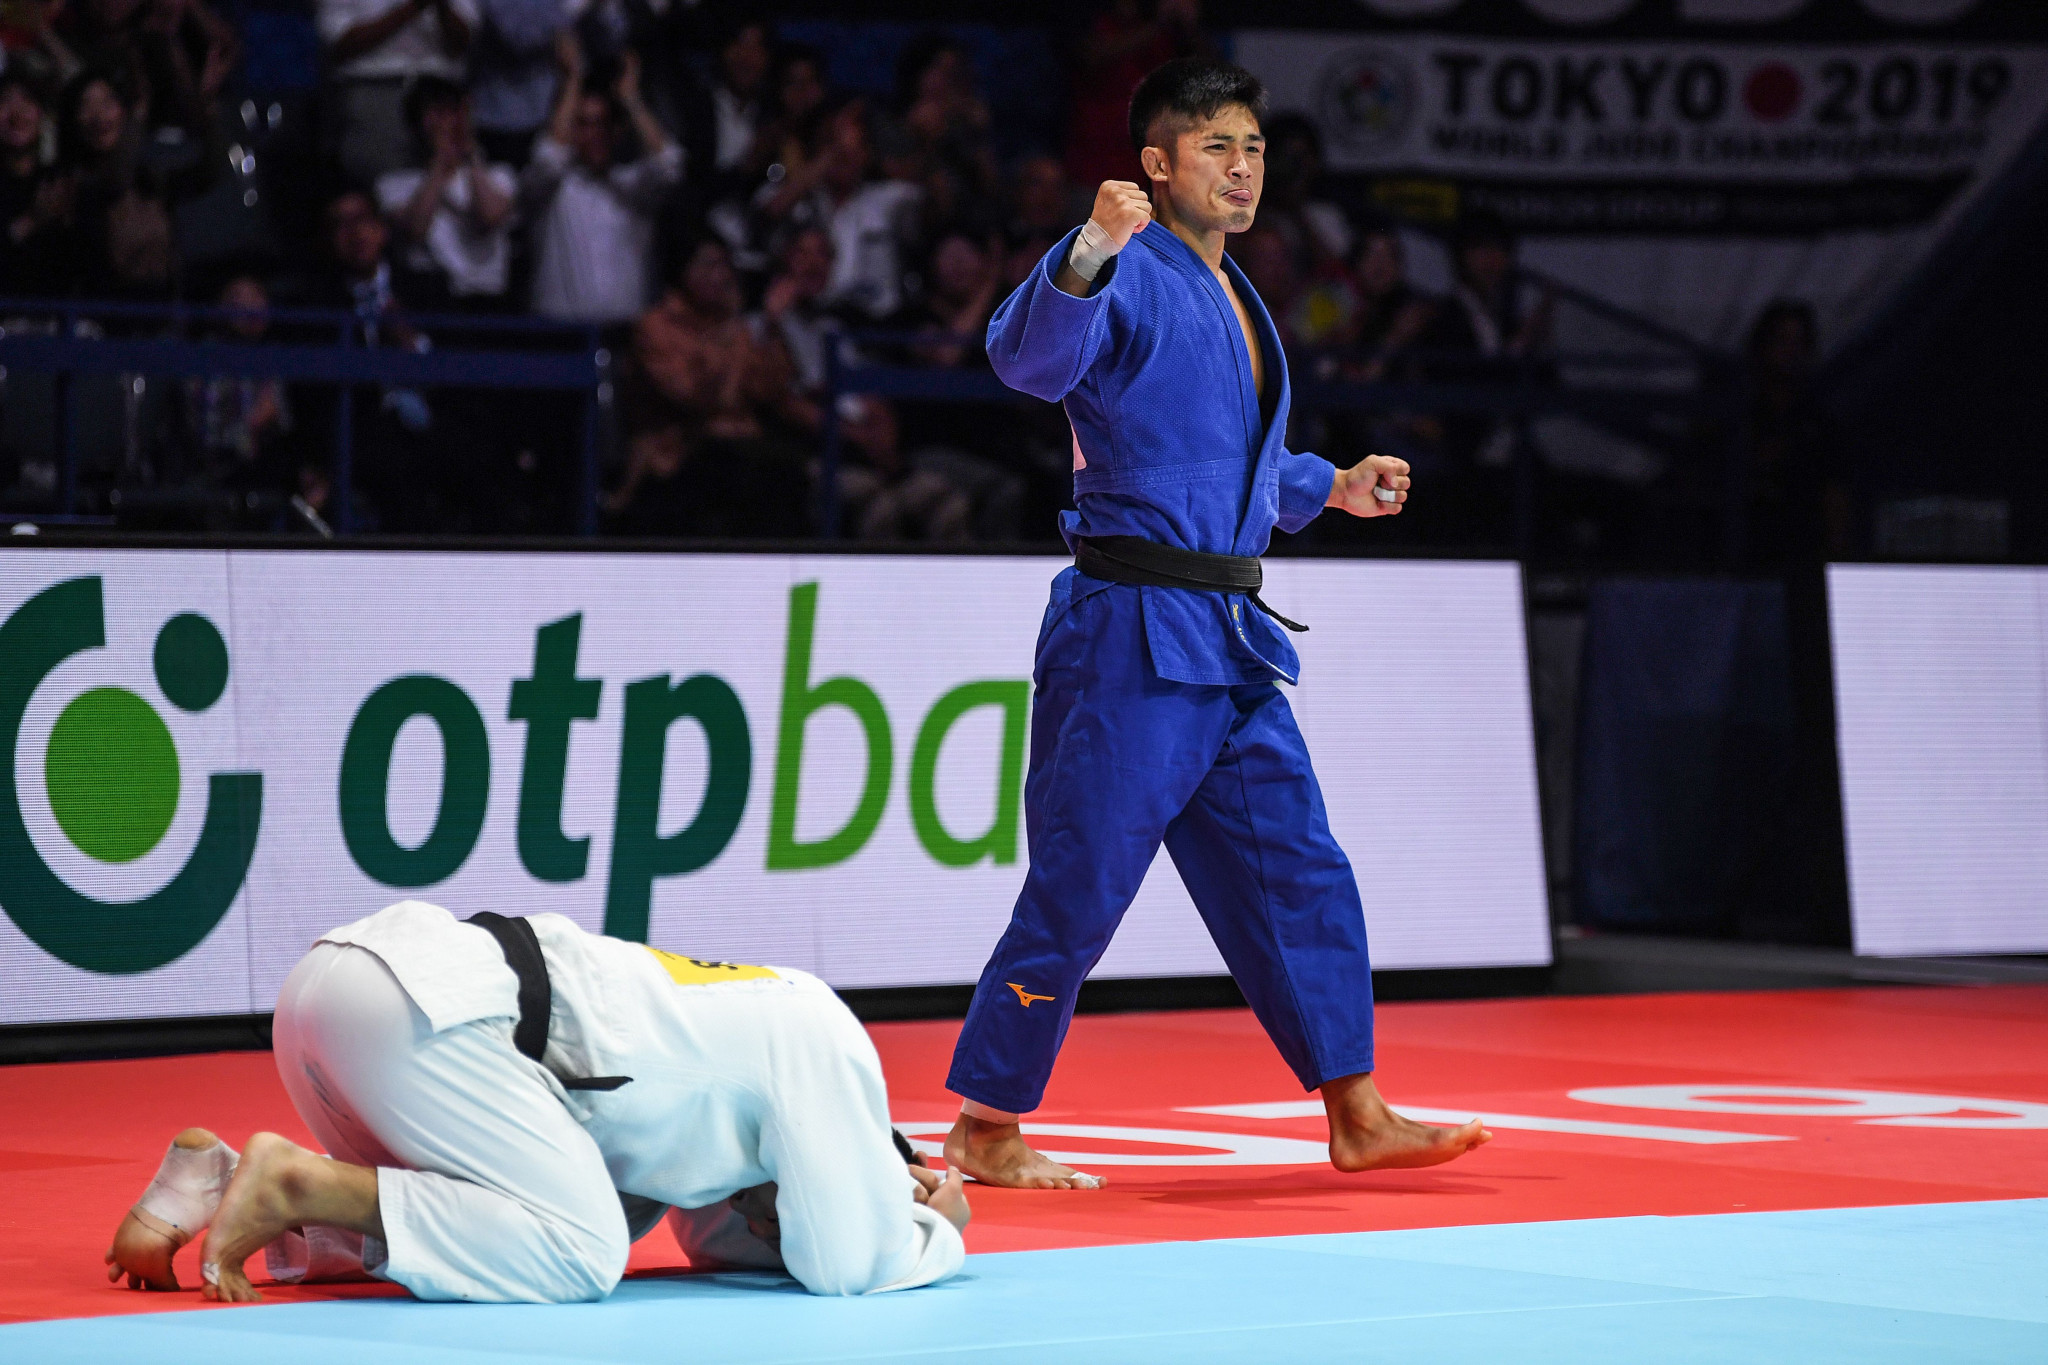 Joshiro Maruyama took the men's under-66kg crown, defeating surprise finalist Kim Lim-hwan of South Korea ©Getty Images